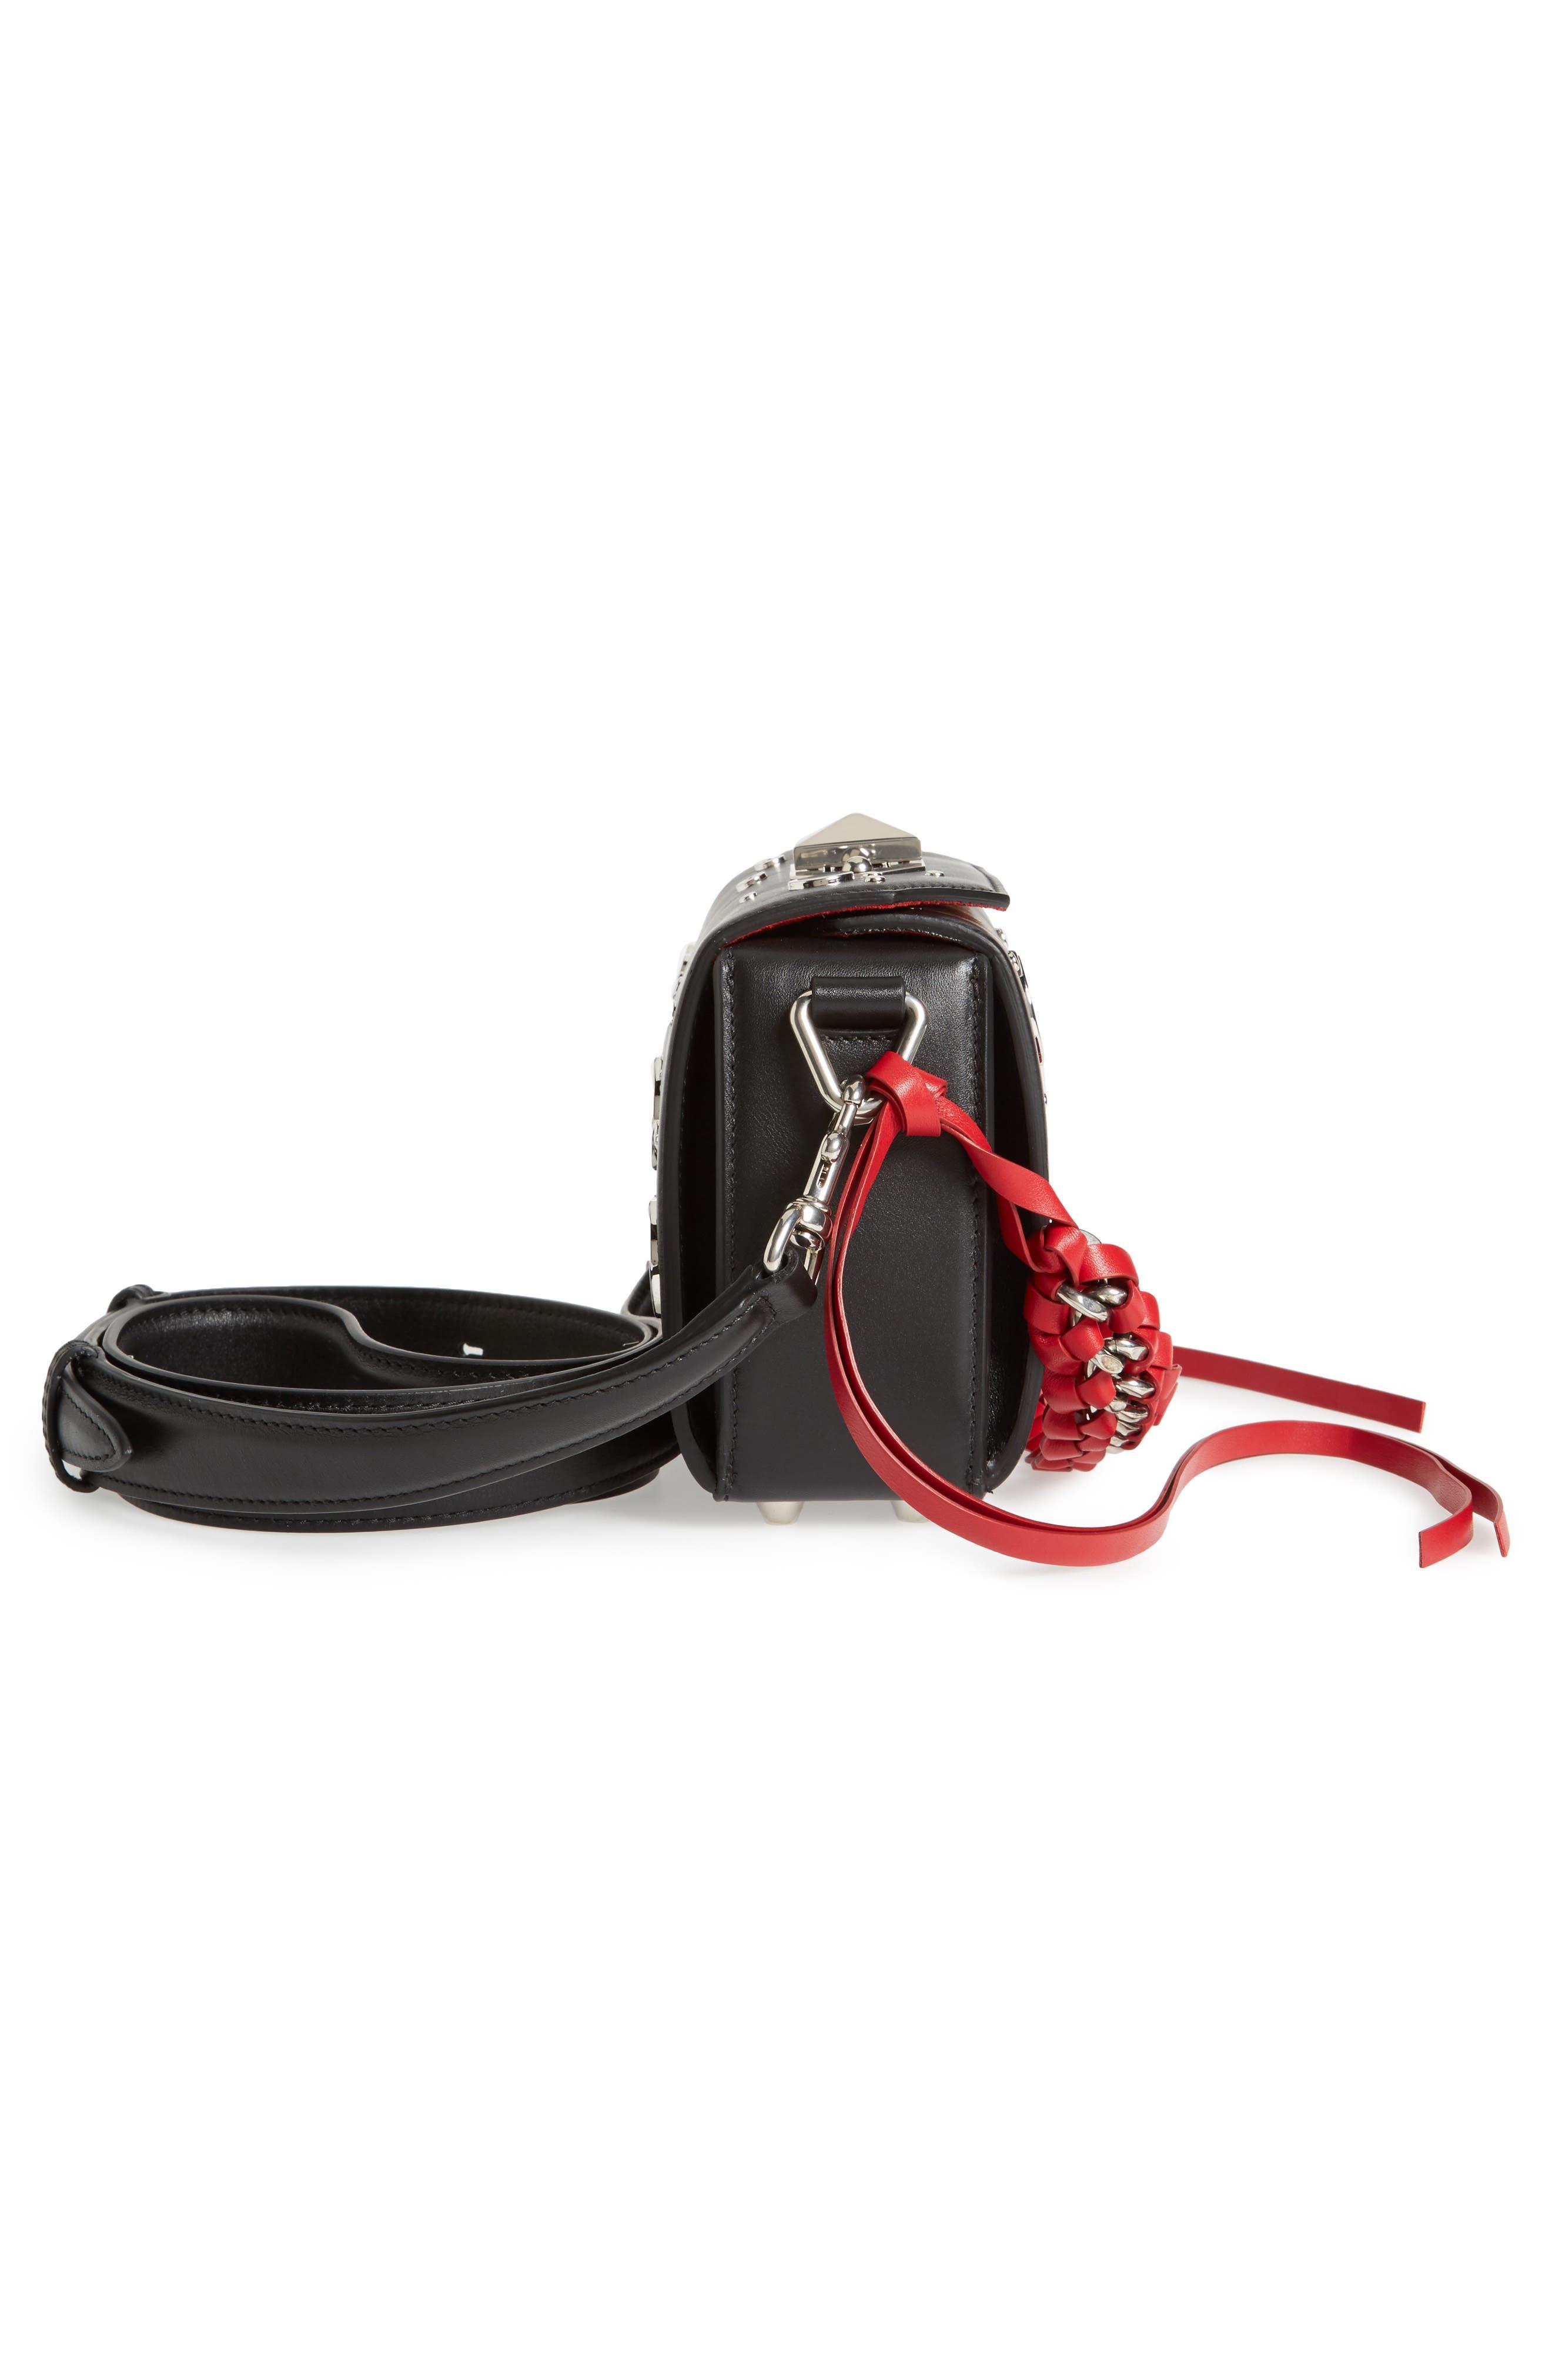 Box Bag 16 Matte Calfskin Bag,                             Alternate thumbnail 4, color,                             Black/ Red